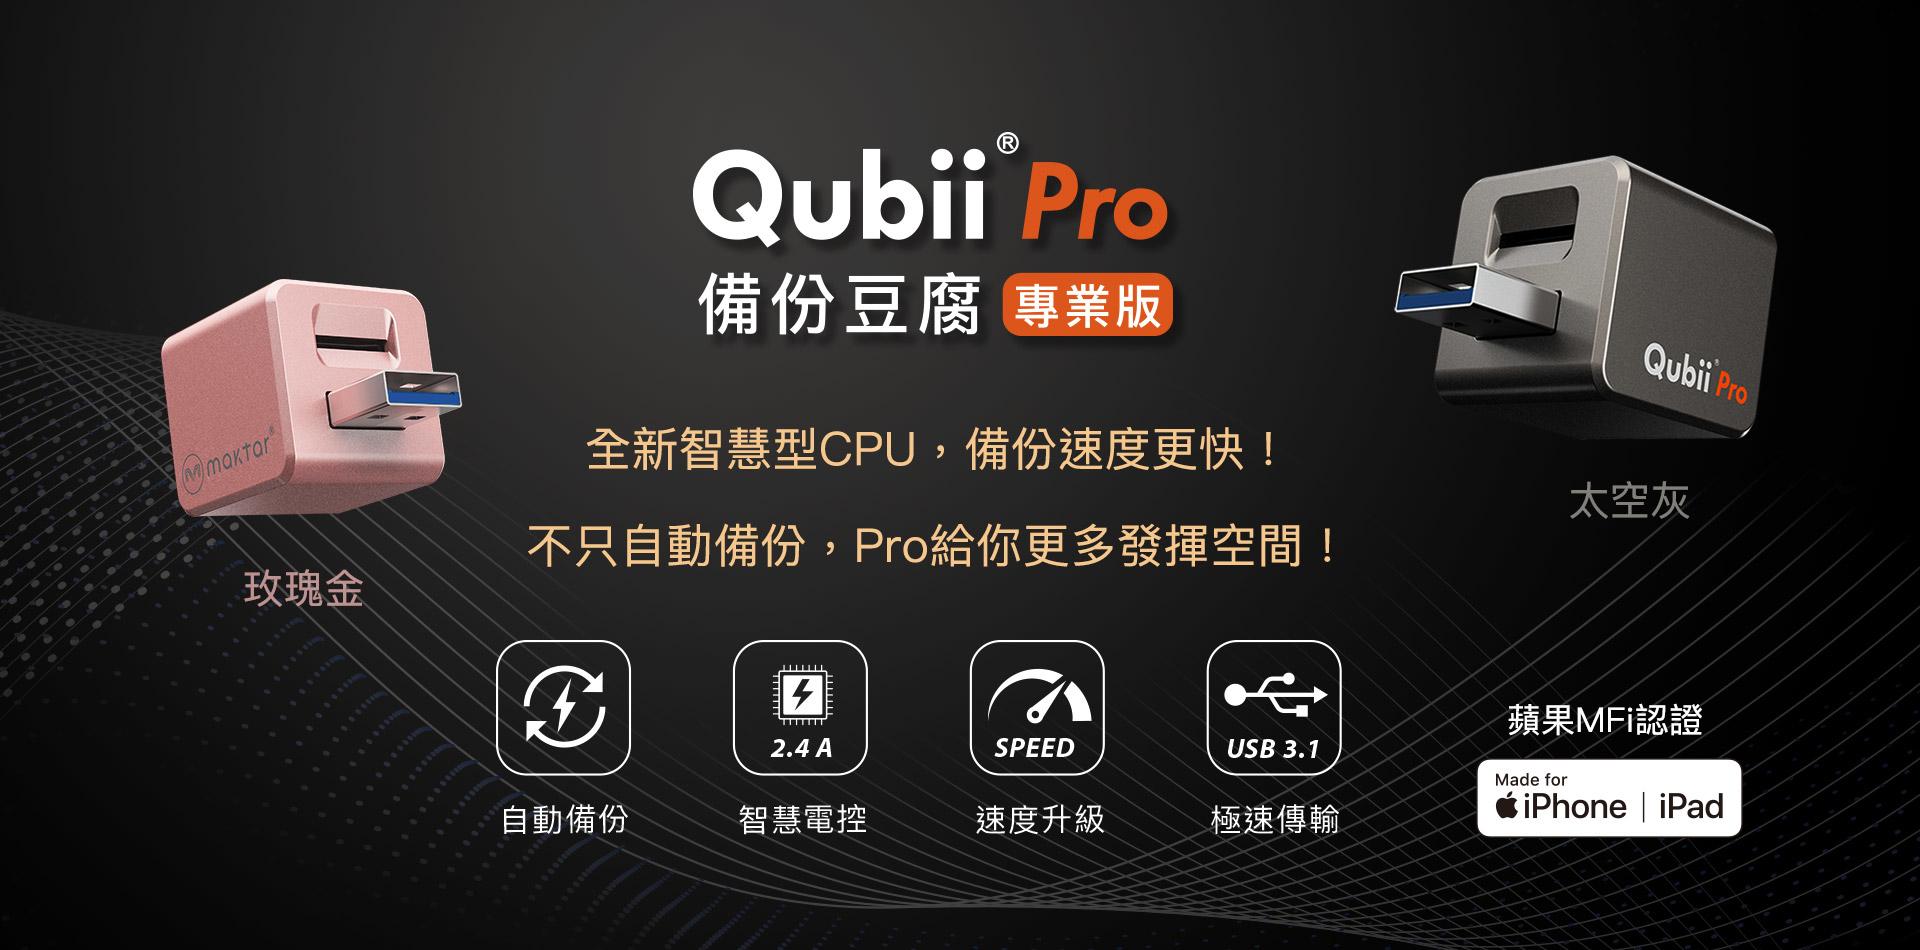 Qubii Pro備份豆腐專業版 速度升級